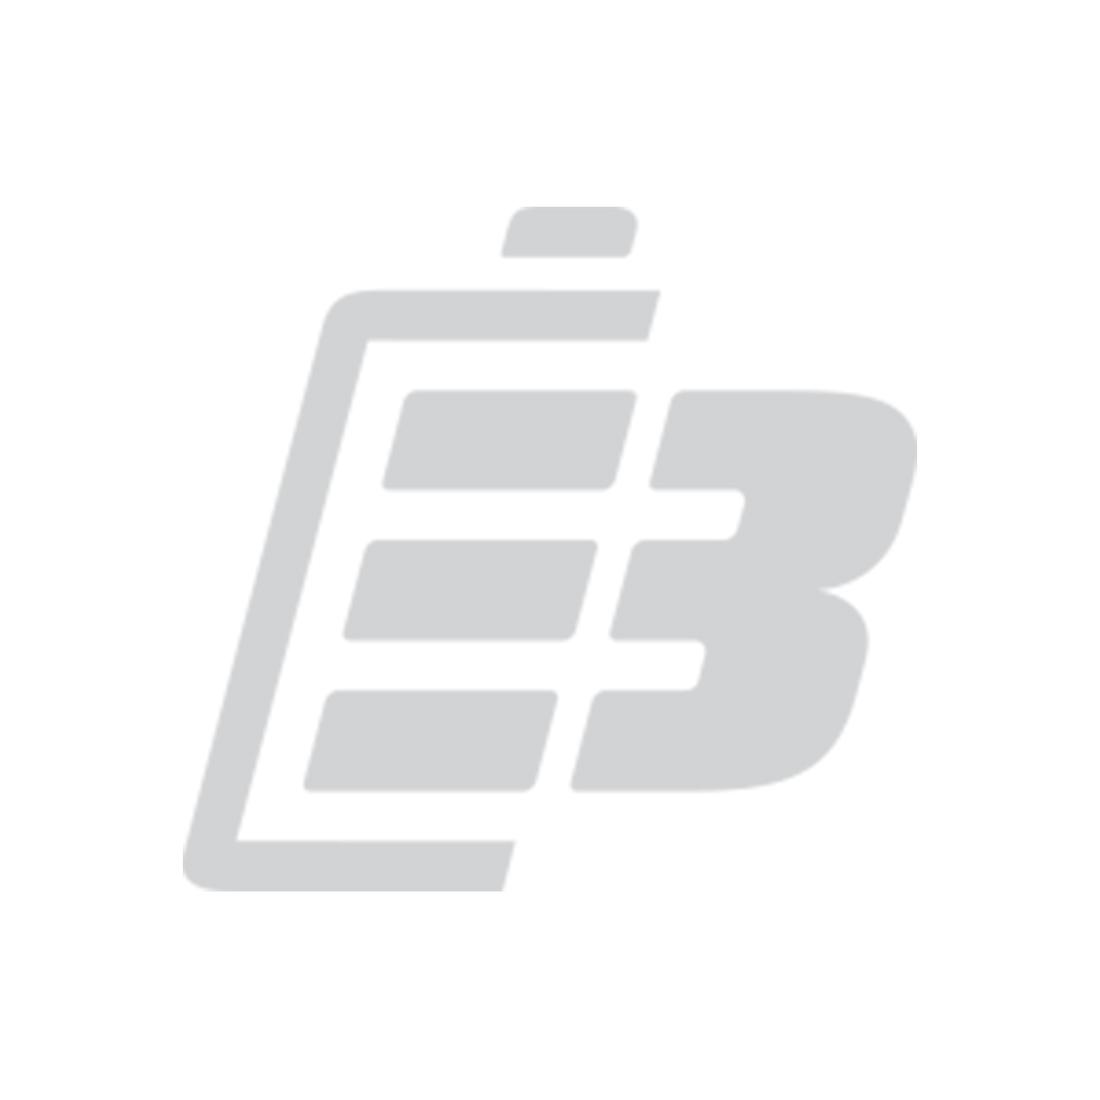 MultiEnergy Lead Acid Battery 12V 2.0Ah_1